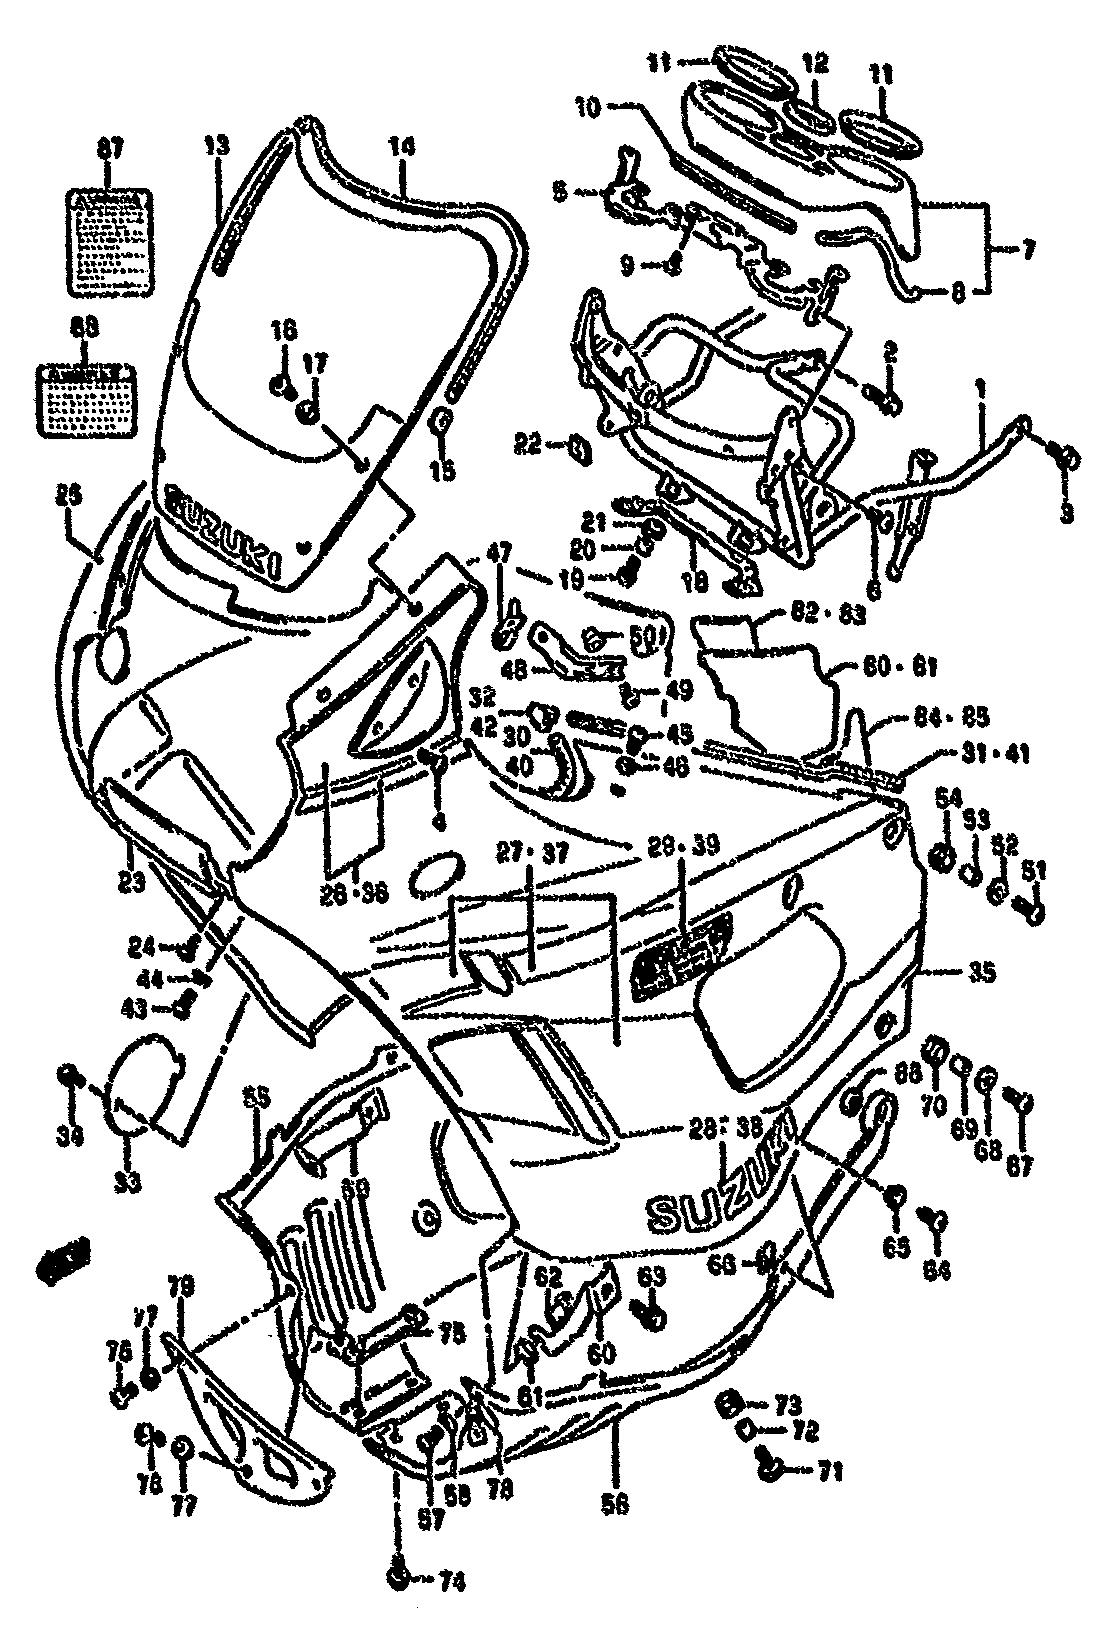 Cupula Suzuki Gsx f 750 1989-1997